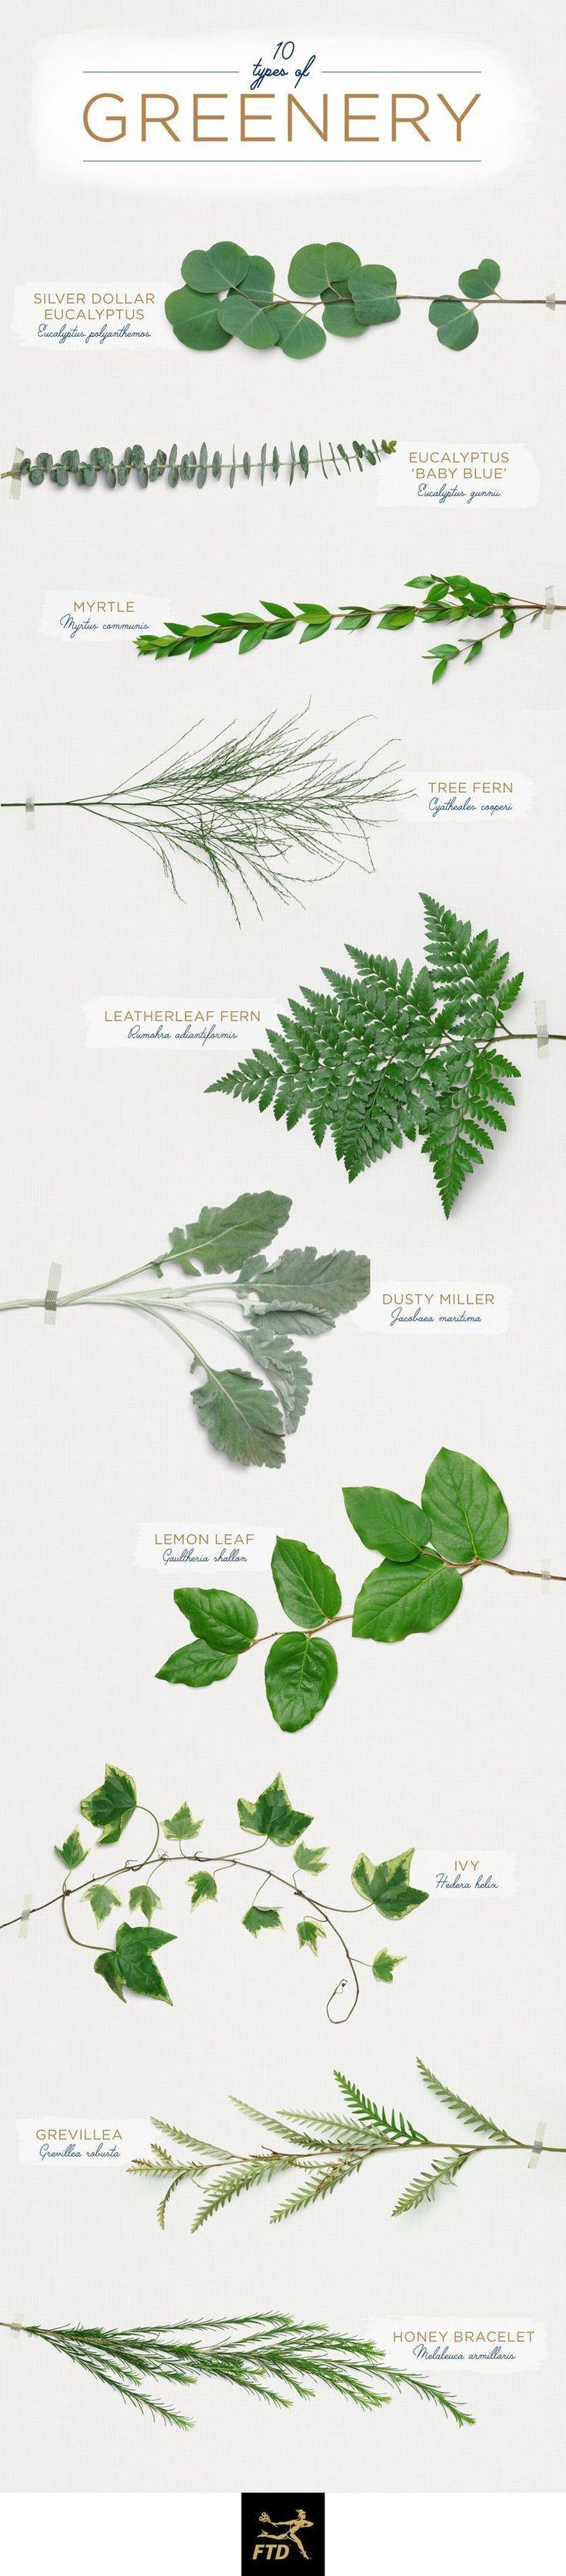 2018 Wedding Trends Greenery. Green wedding Flowers Guide on How to DIY Wedding Flowers.  #greenery #weddingtrends #diywedding #weddingplanningguide